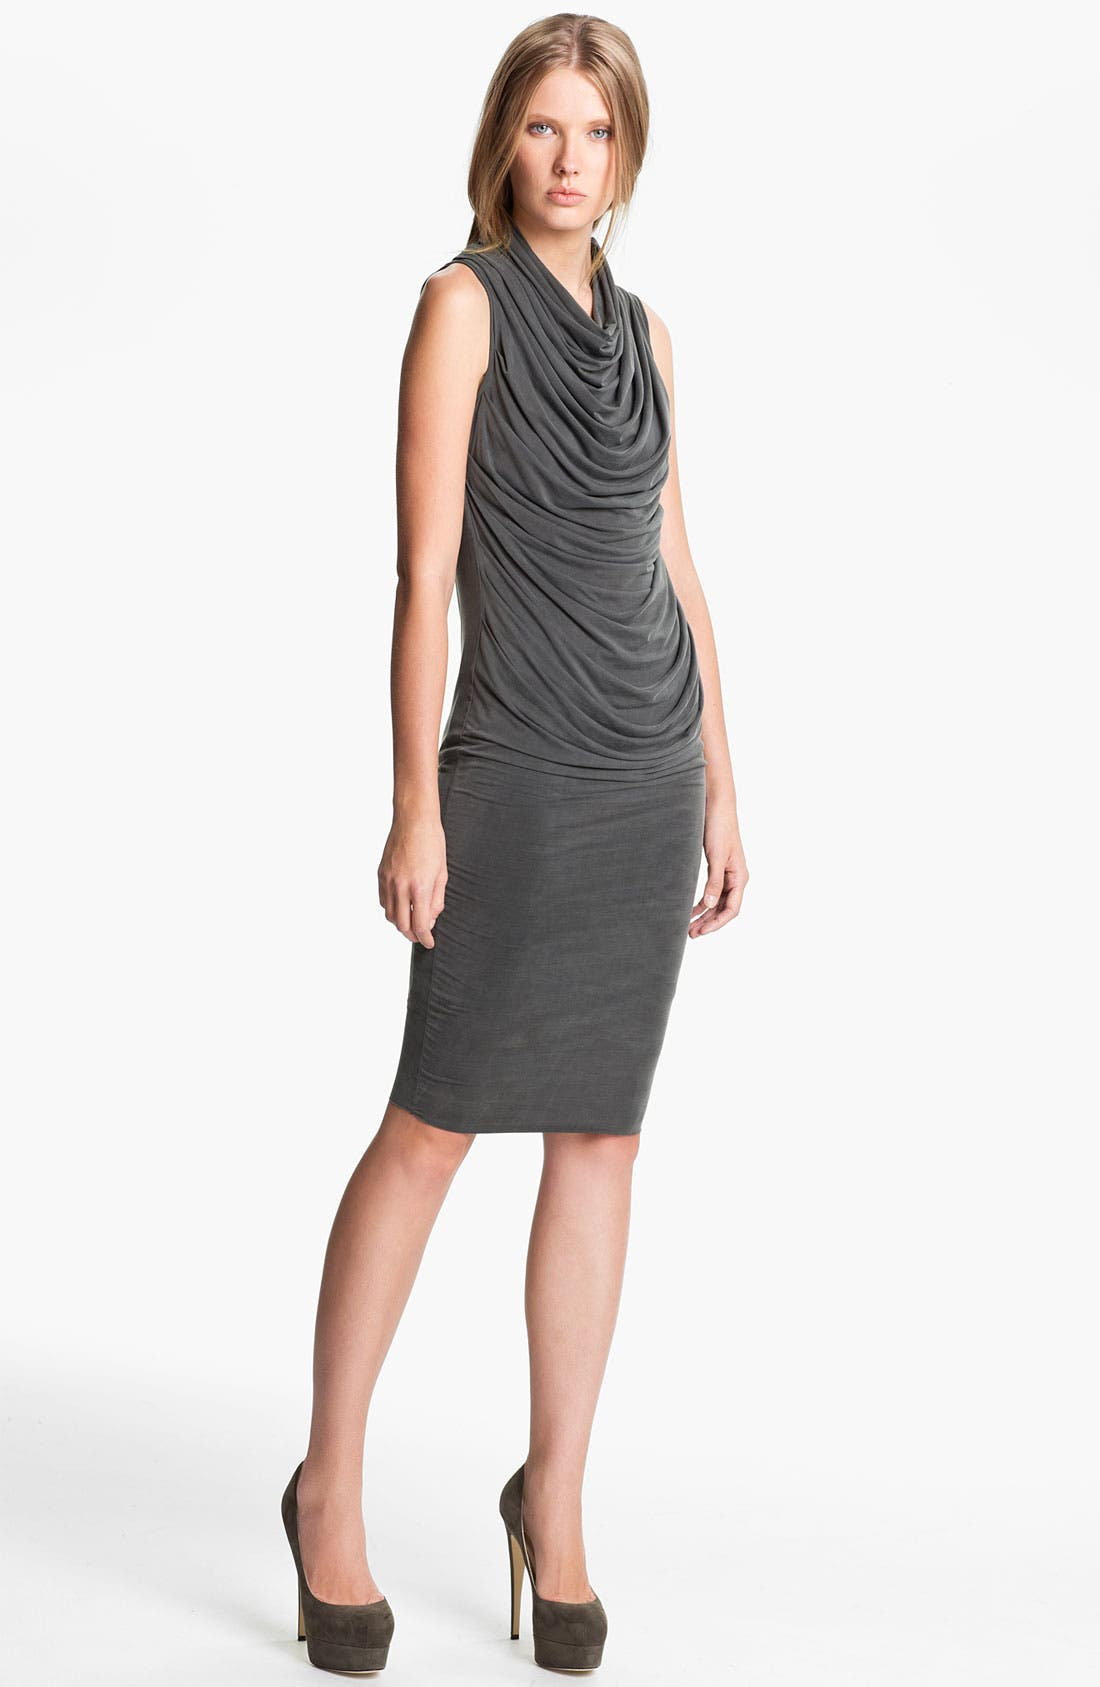 Main Image - Helmut Lang 'Shade' Sleeveless Draped Dress